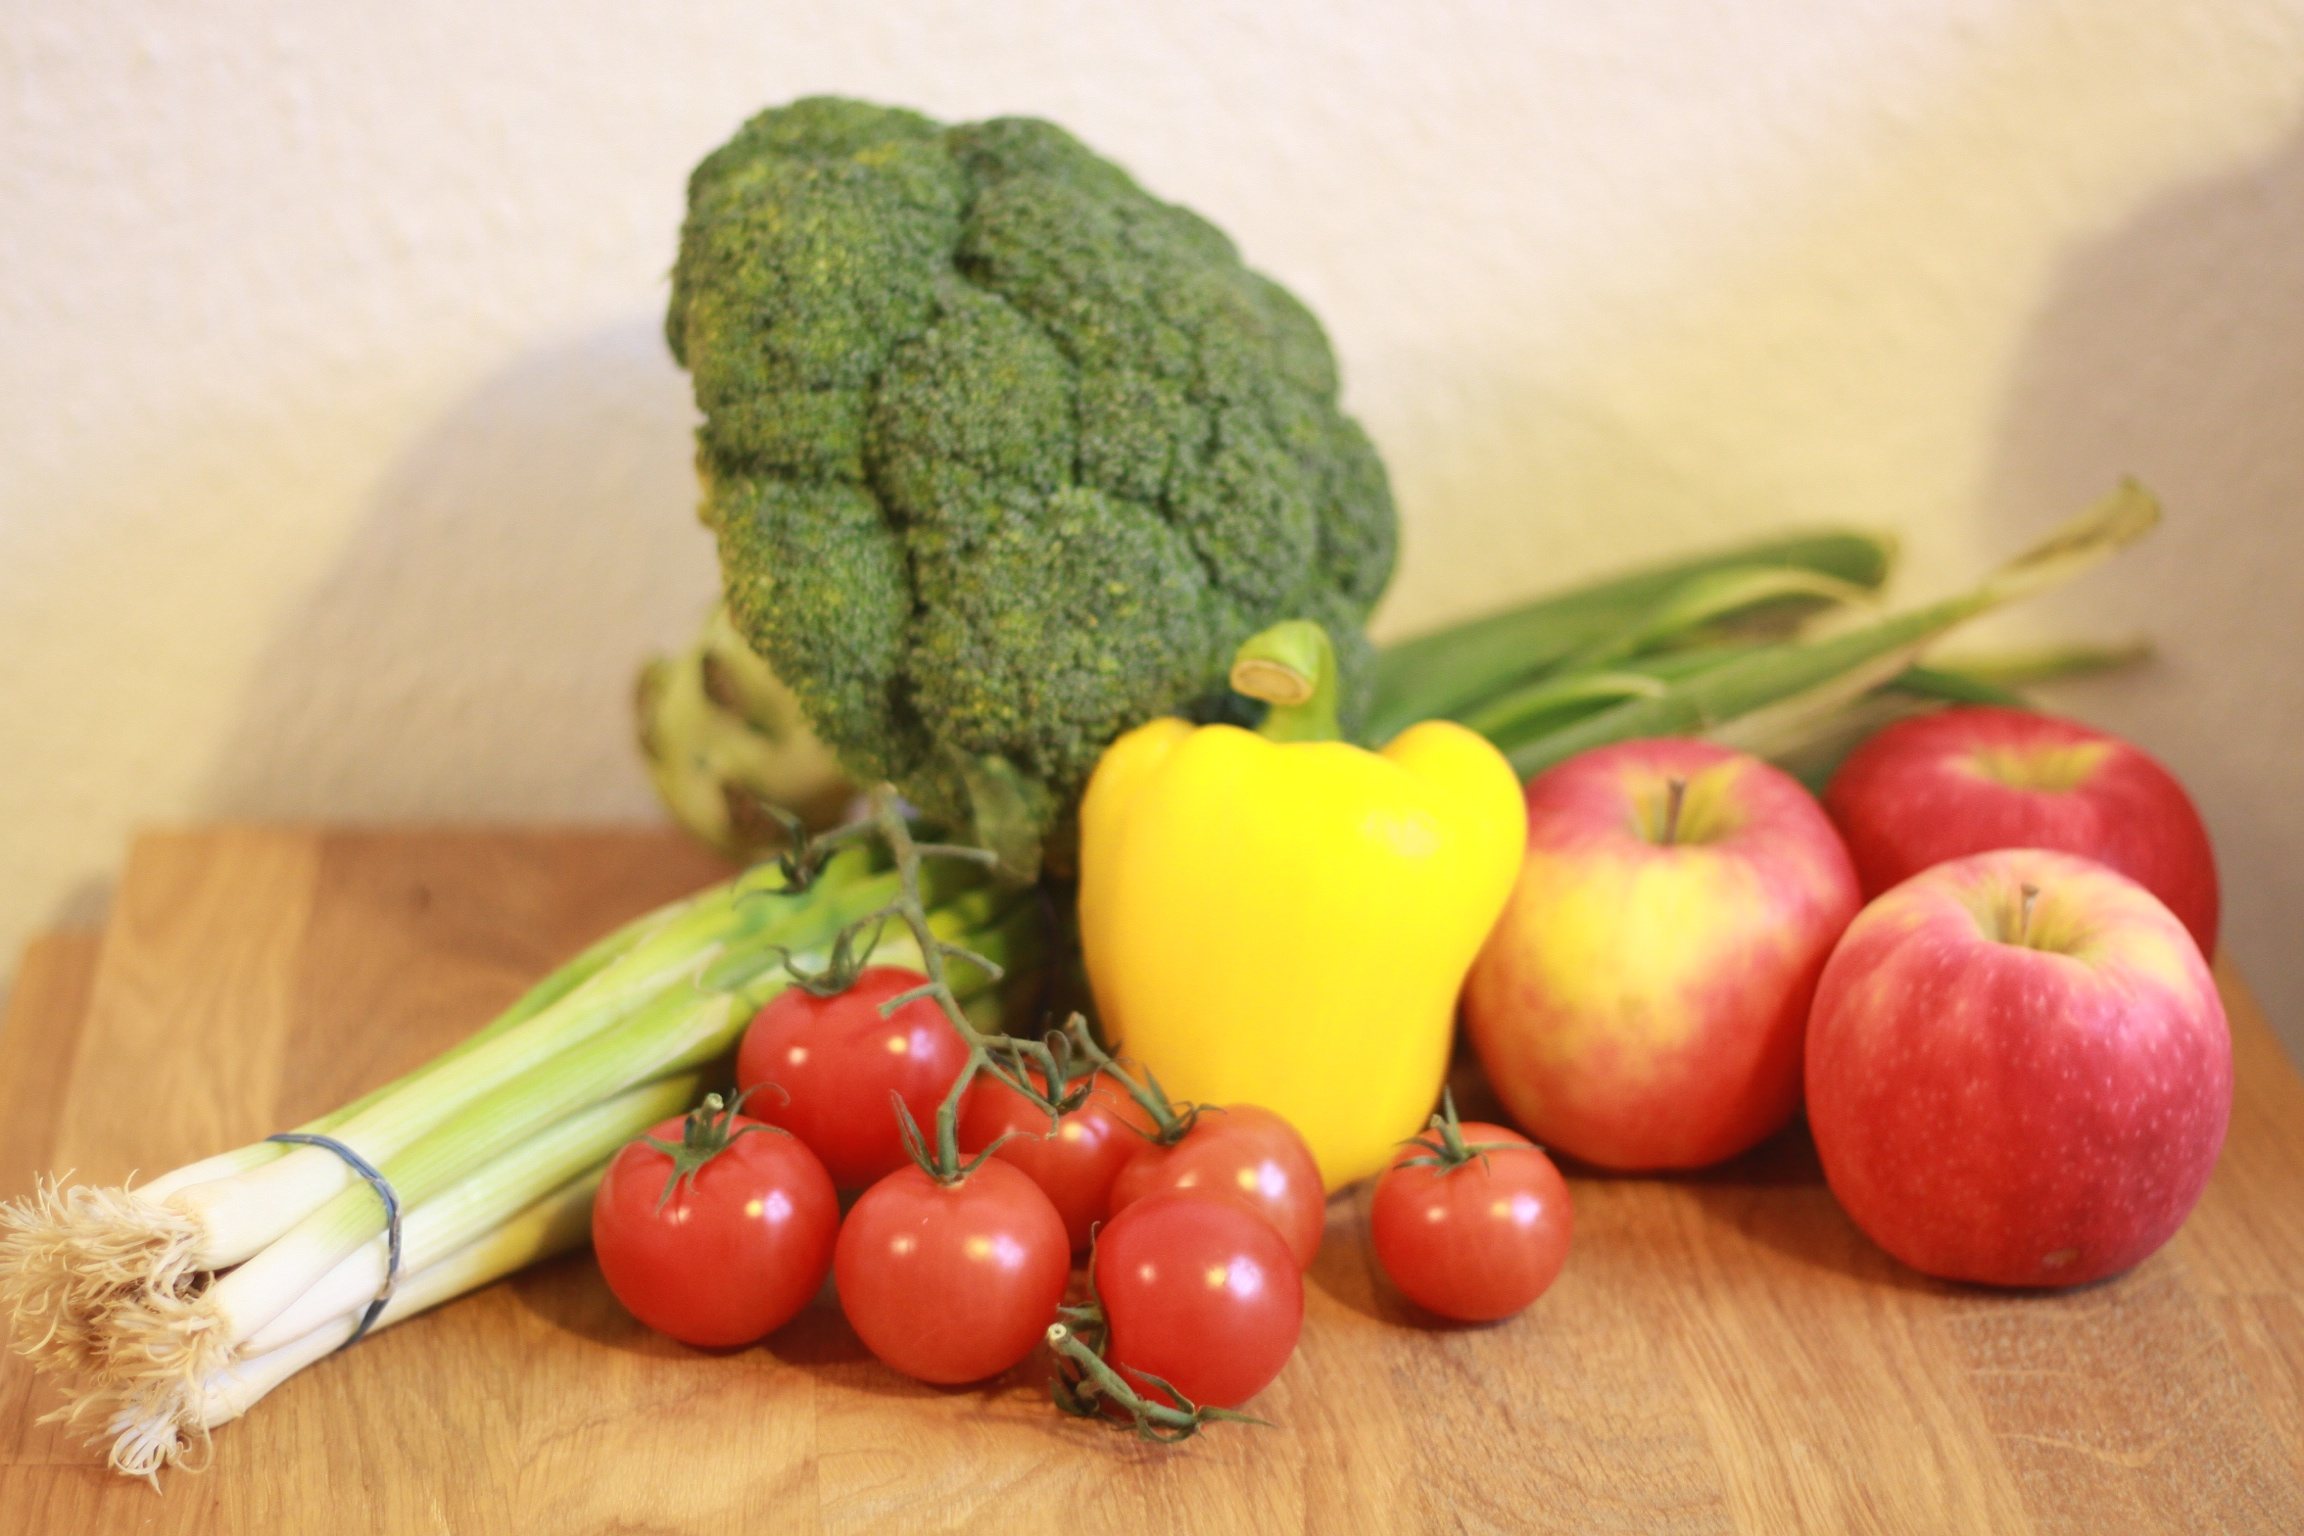 Gemüse at home